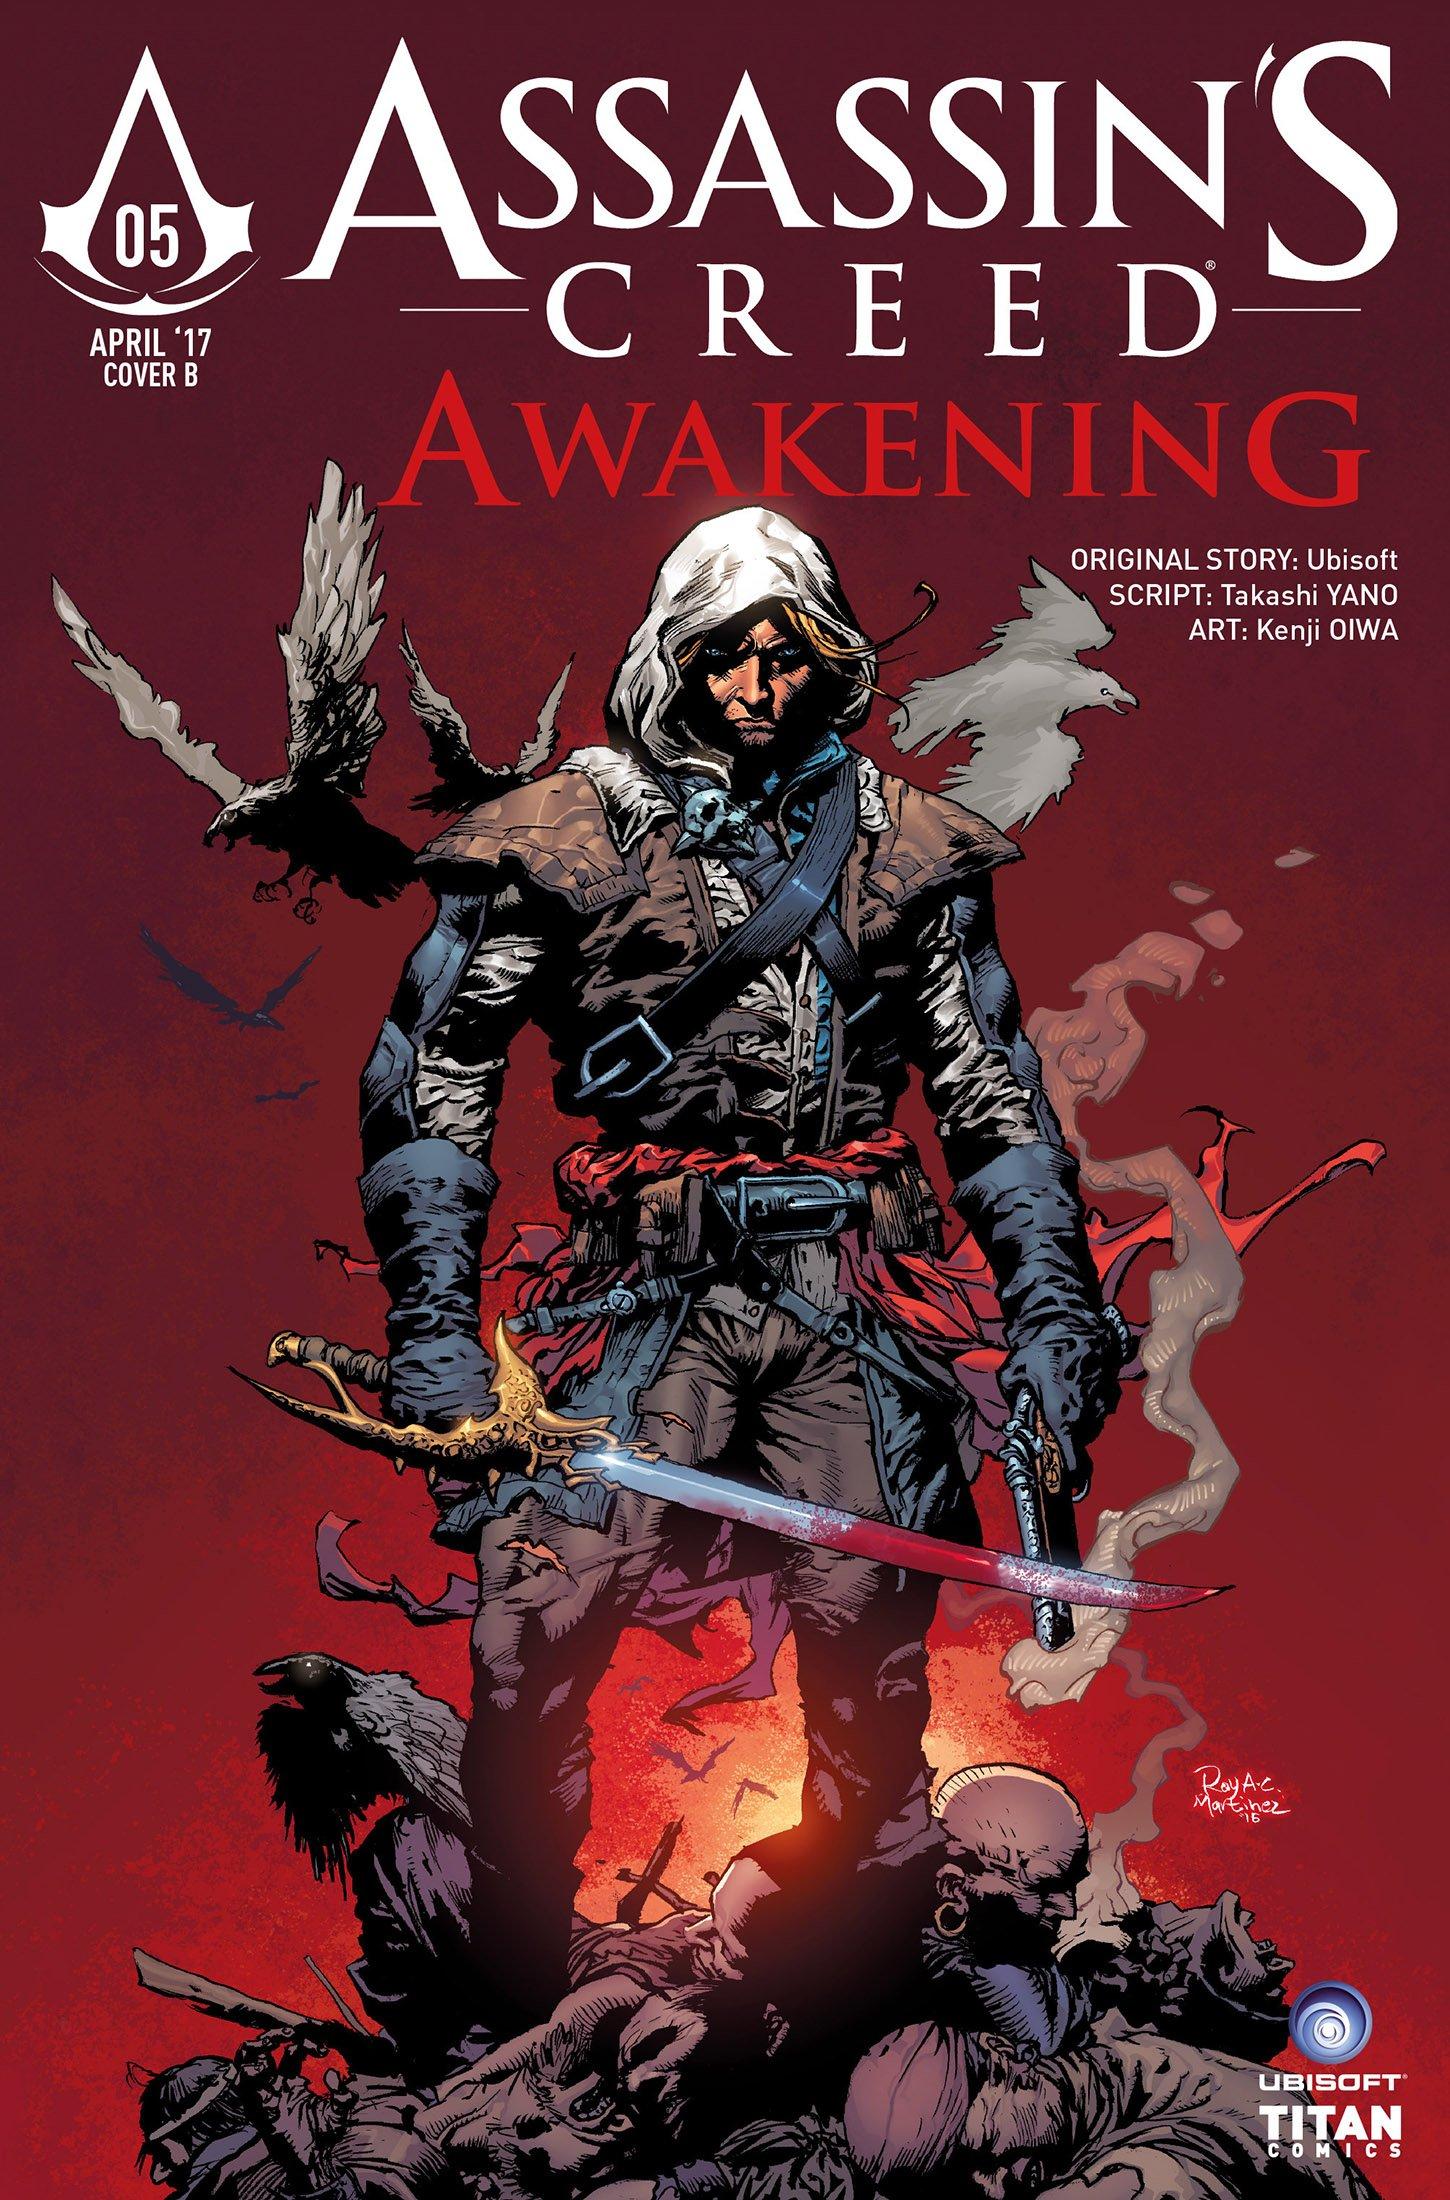 Assassin's Creed - Awakening 05 (April 2017) (cover b)